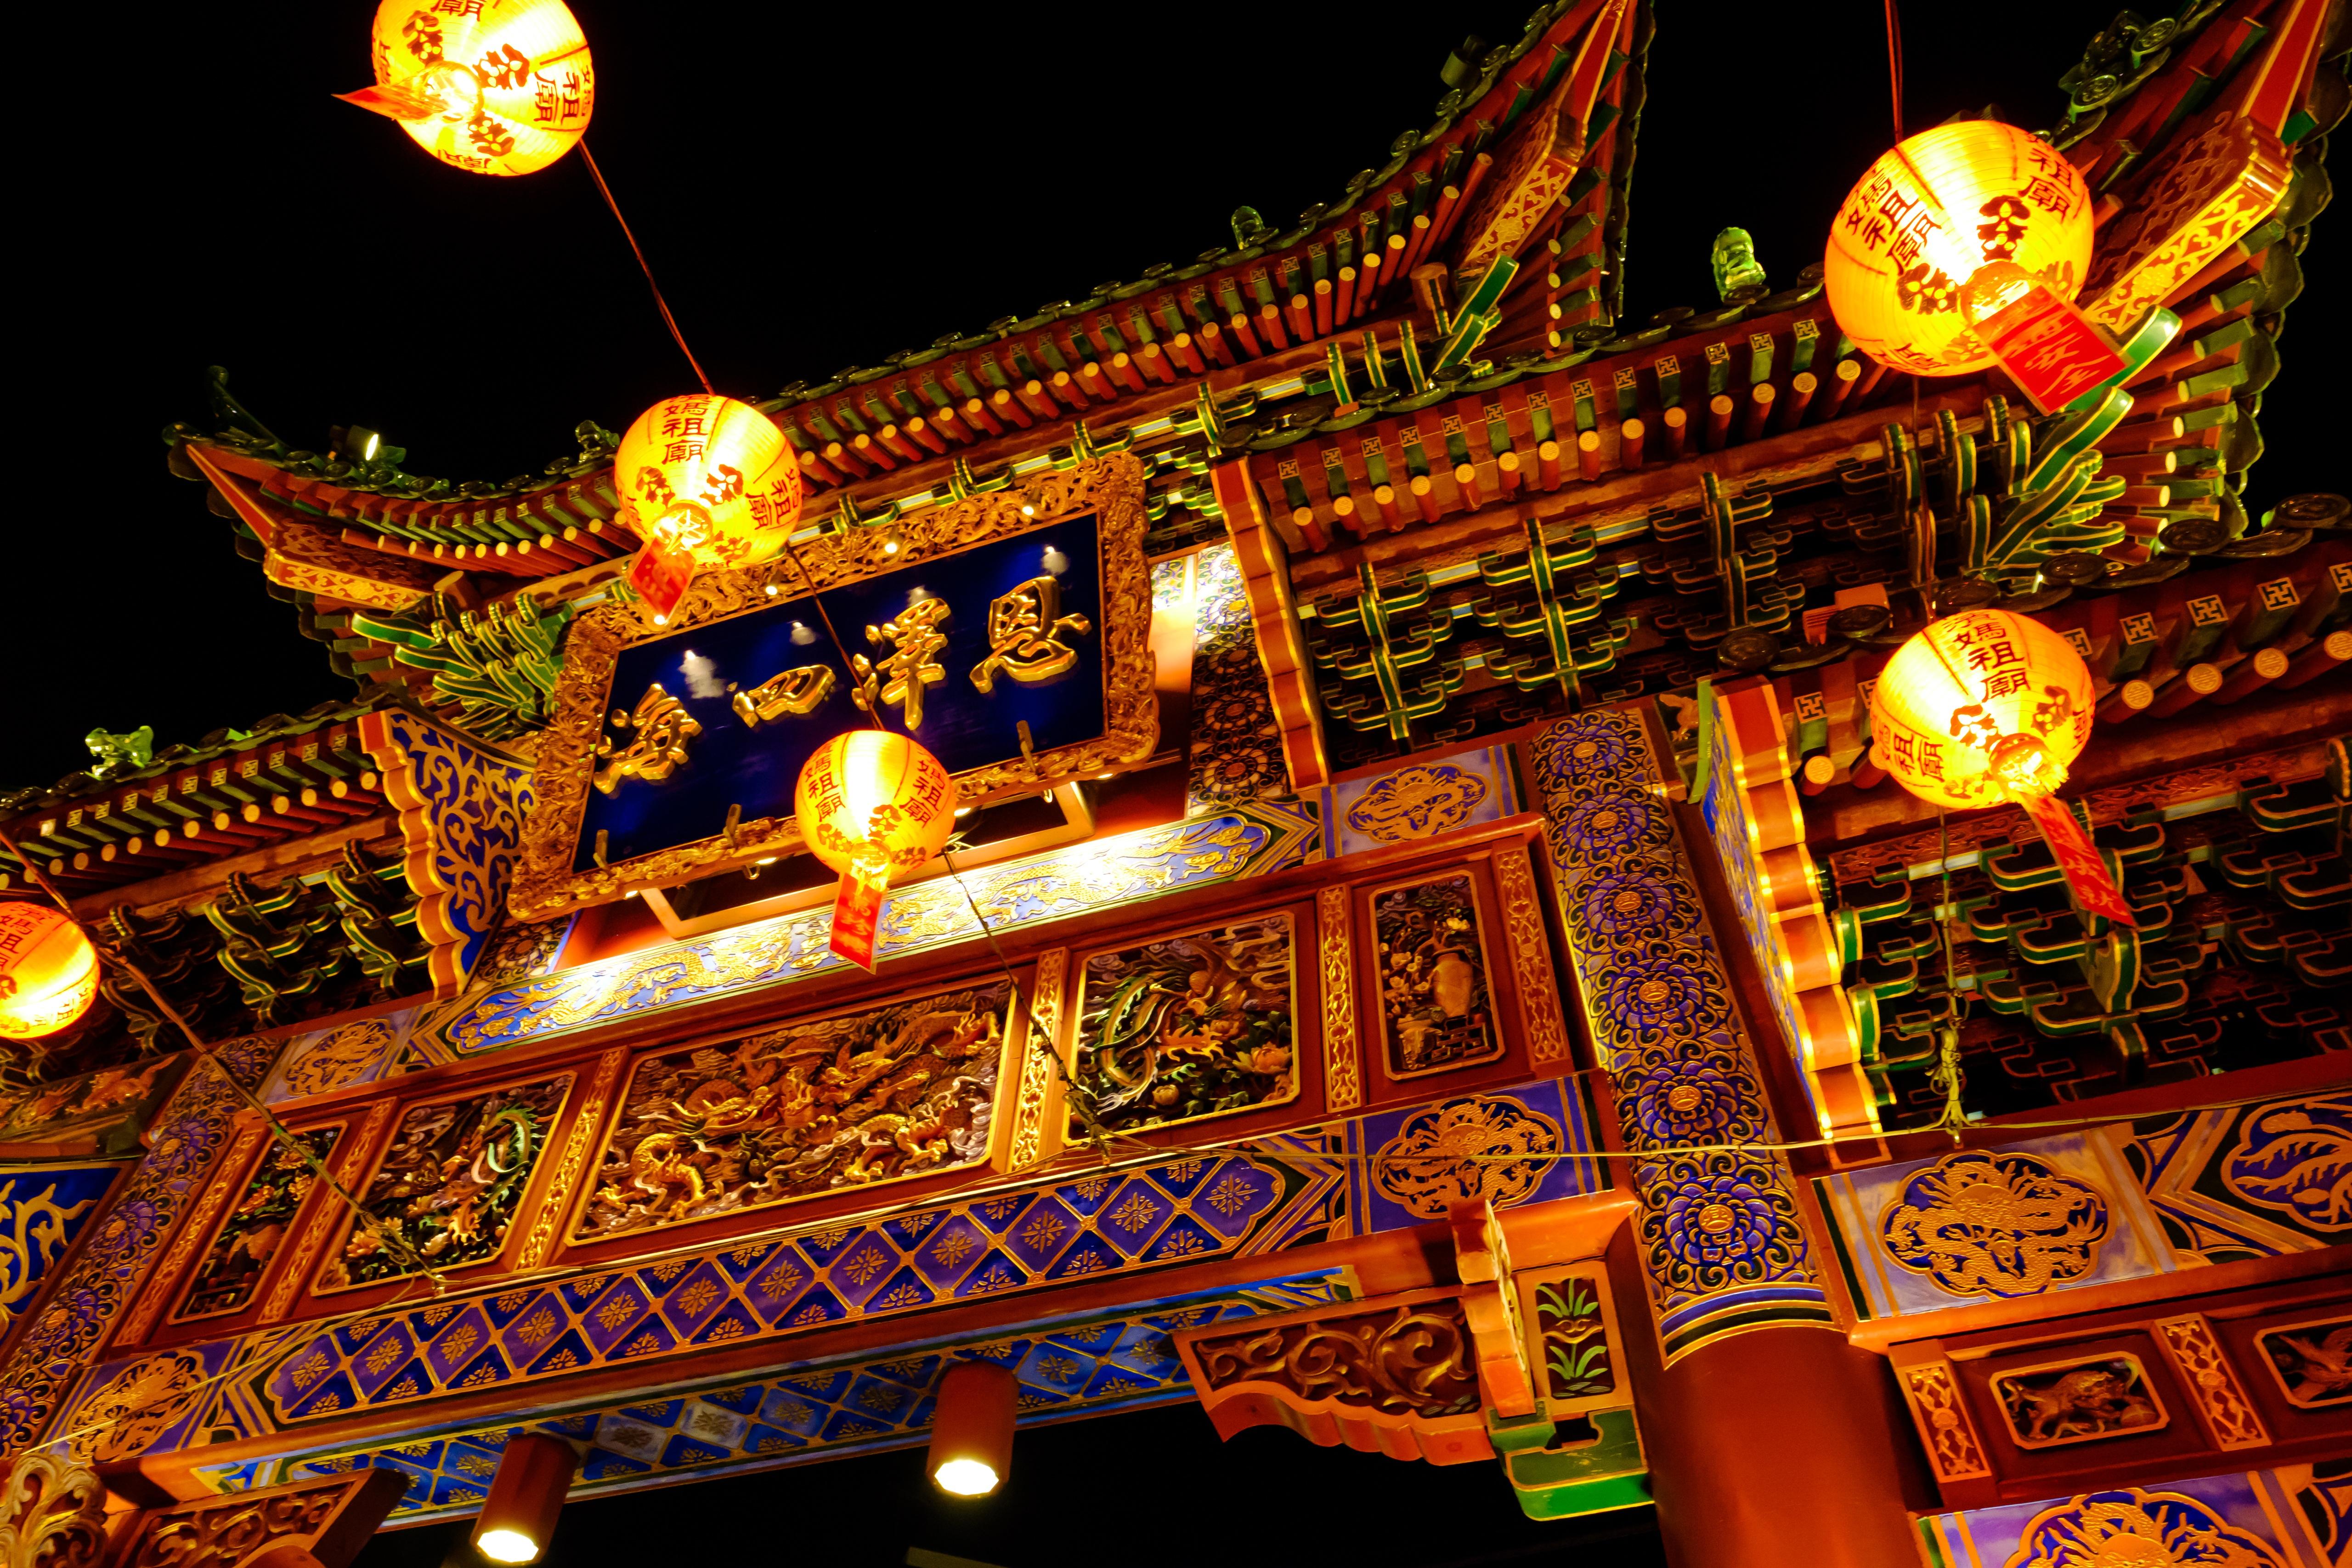 Night Building Lamp Lighting Place Of Worship China Town Temple Shrine  Yokohama Chinatown Kanagawa Japan Hindu